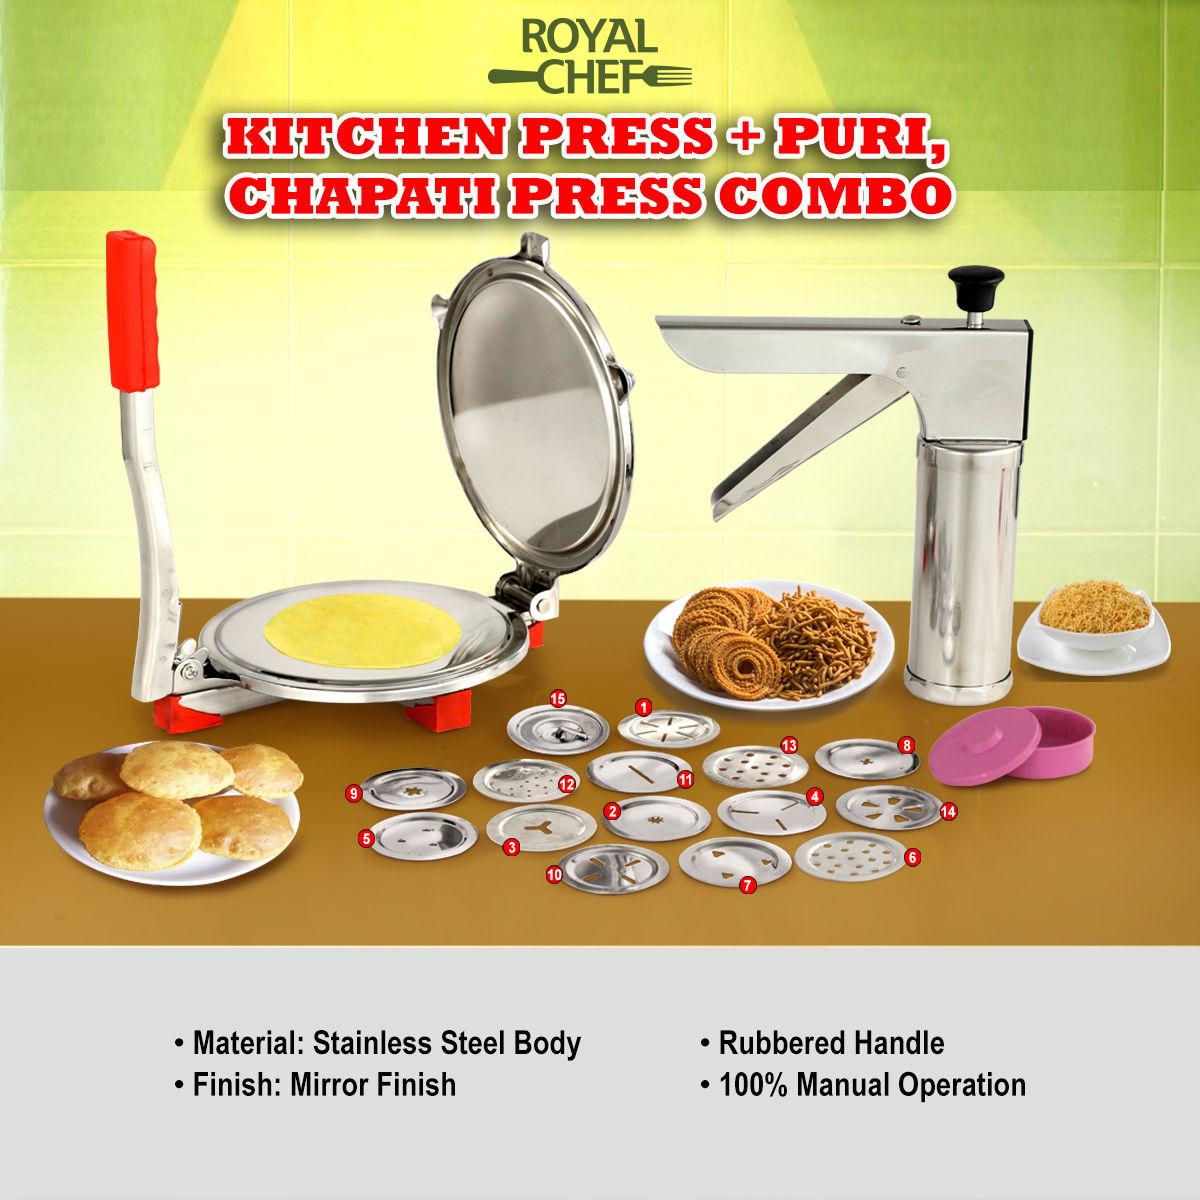 Buy royal chef kitchen press puri chapati press combo for Naaptol kitchen queen set